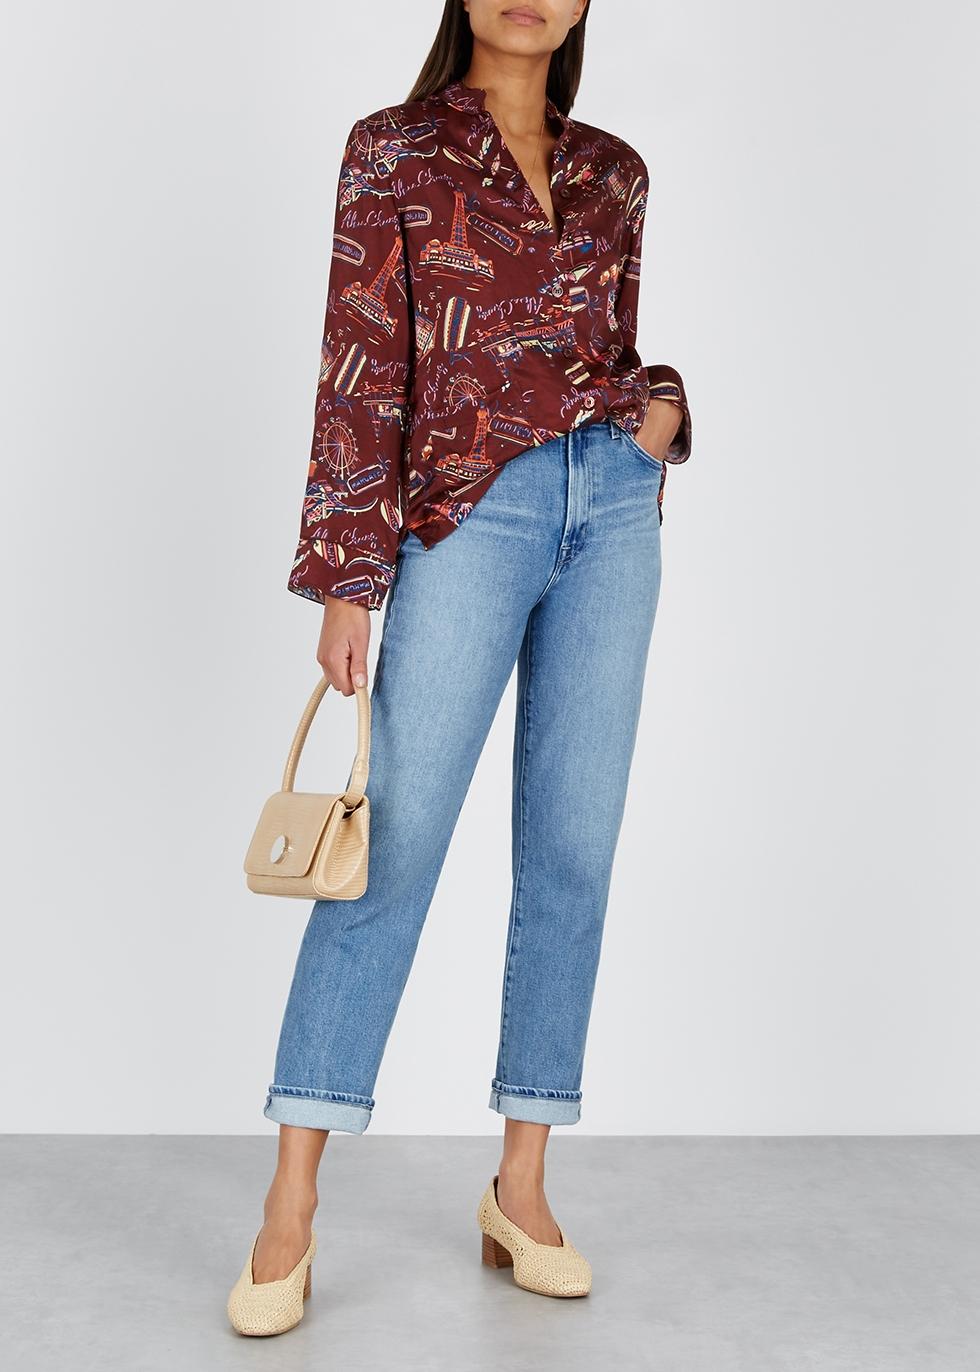 Jules blue straight-leg jeans - J Brand